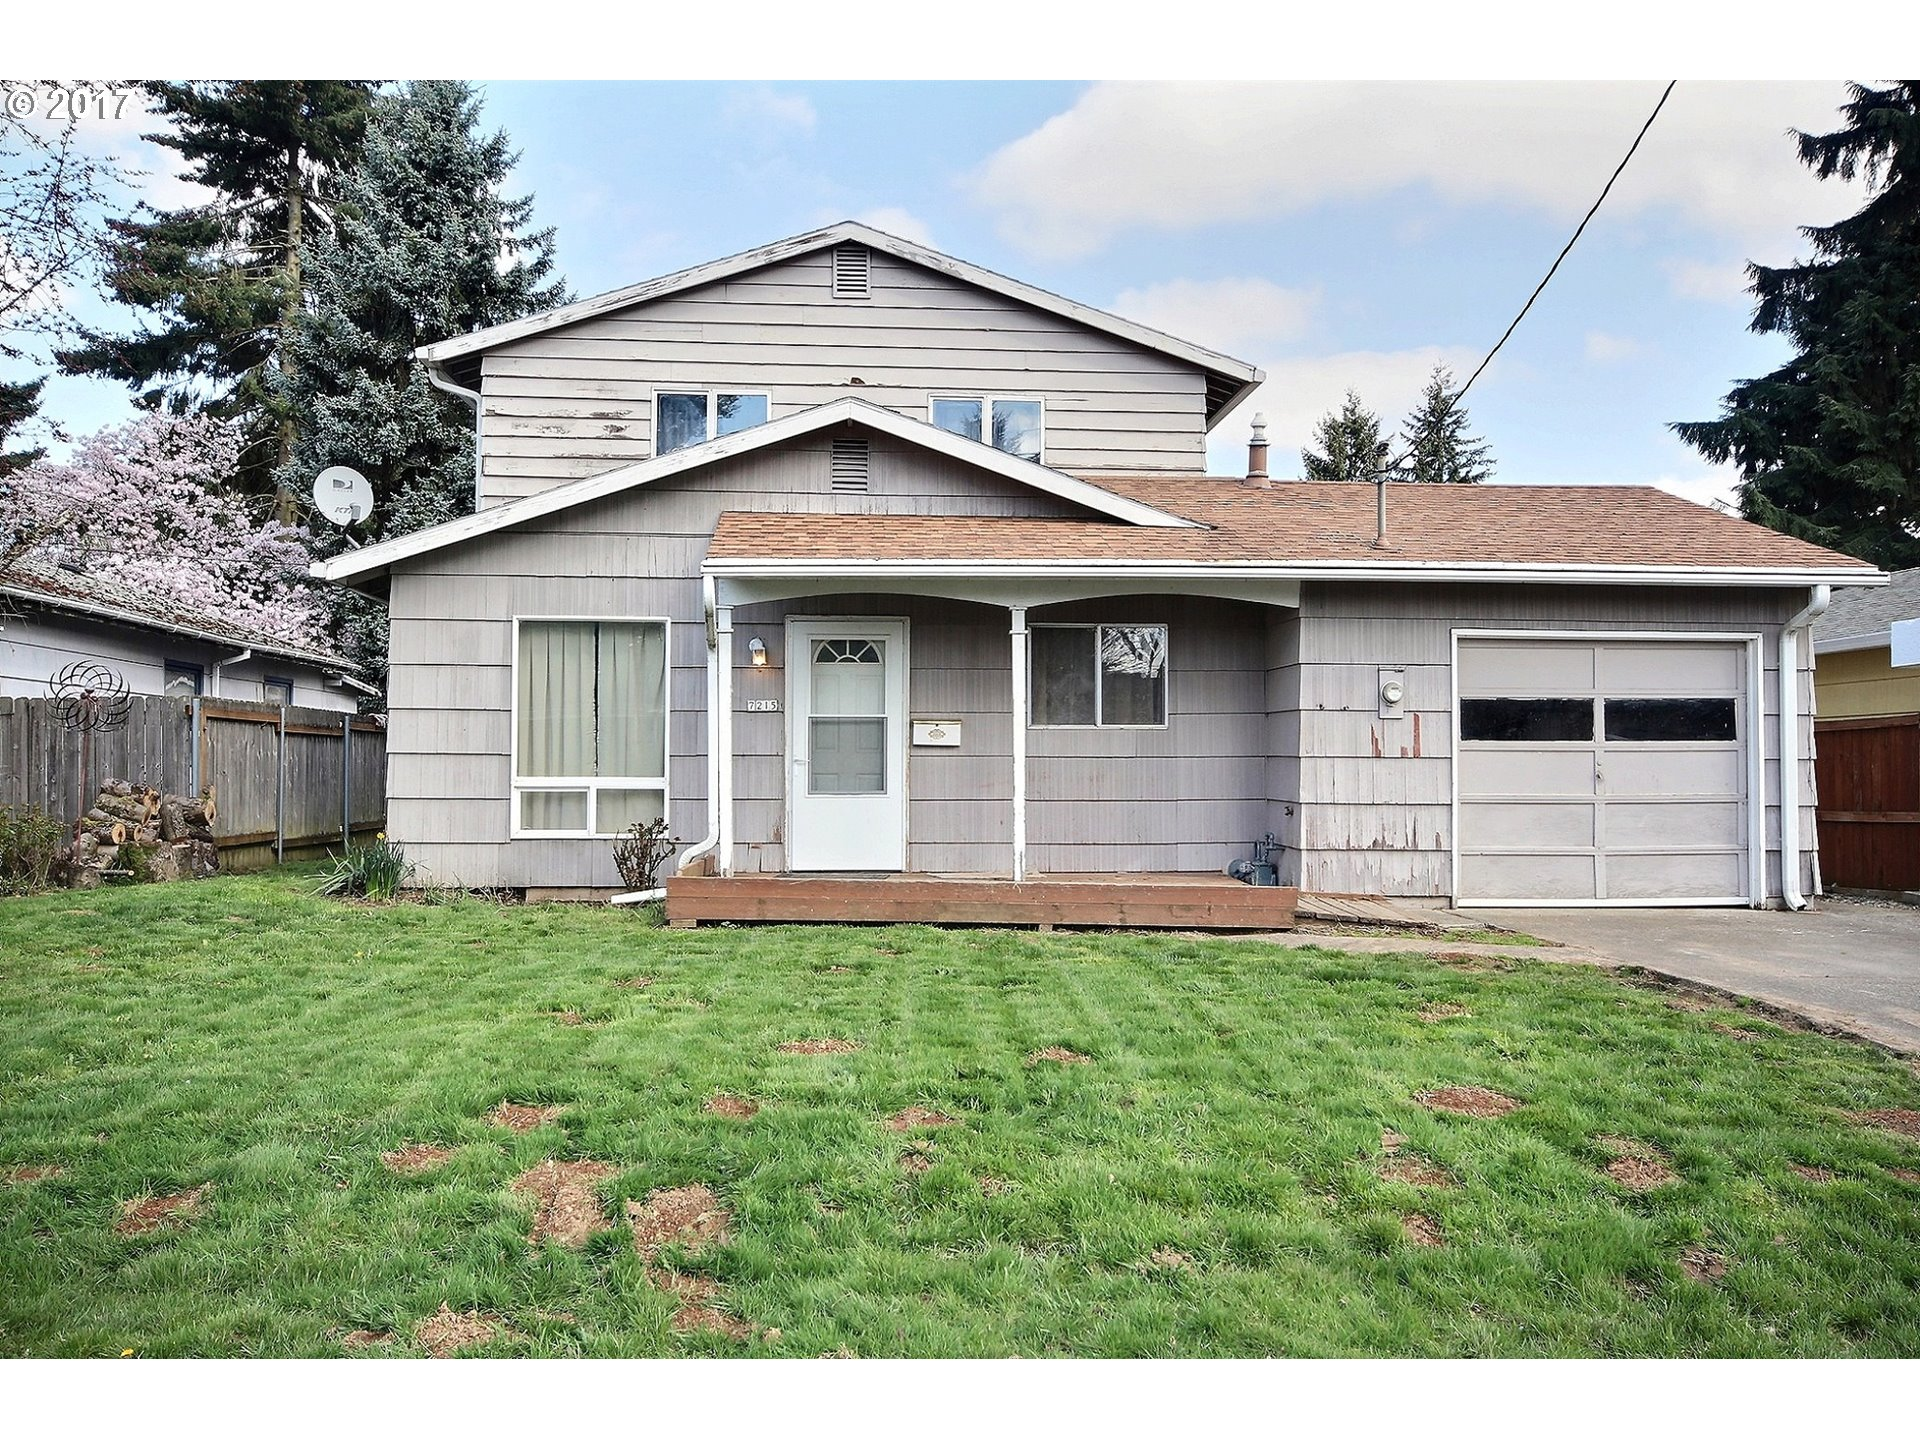 7215 N SWIFT ST, Portland, OR 97203